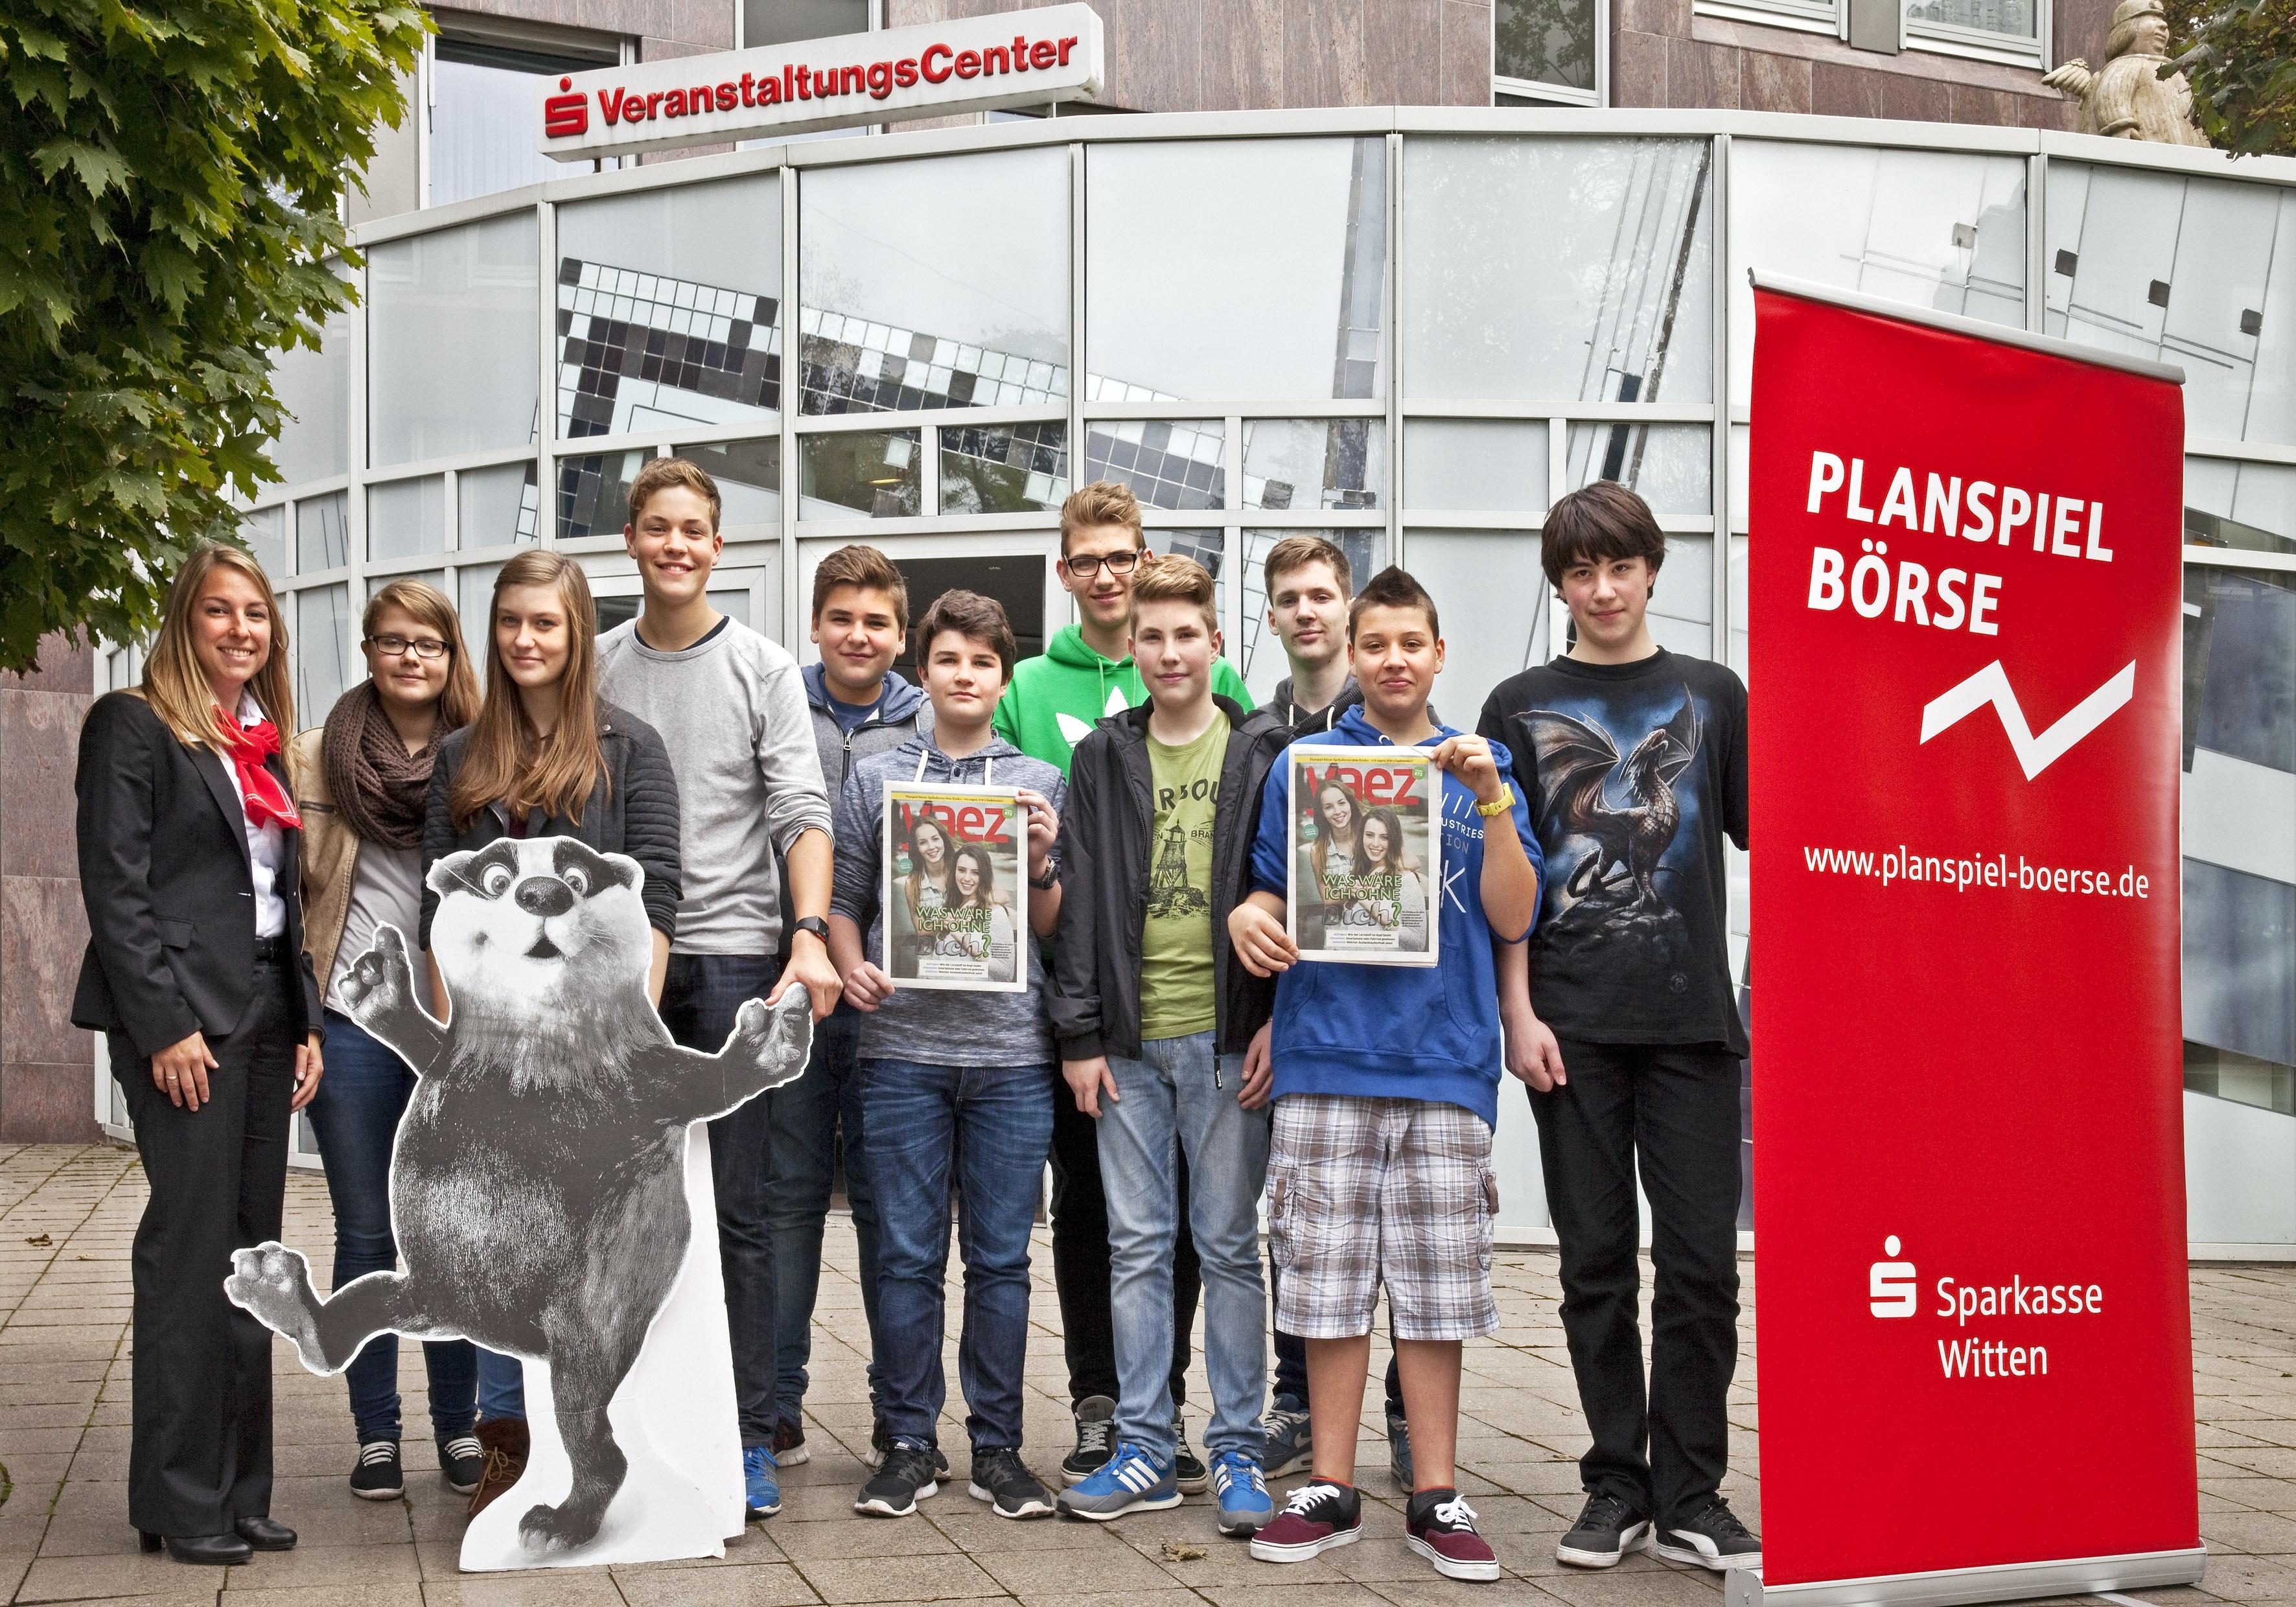 Planspiel Börse 2014